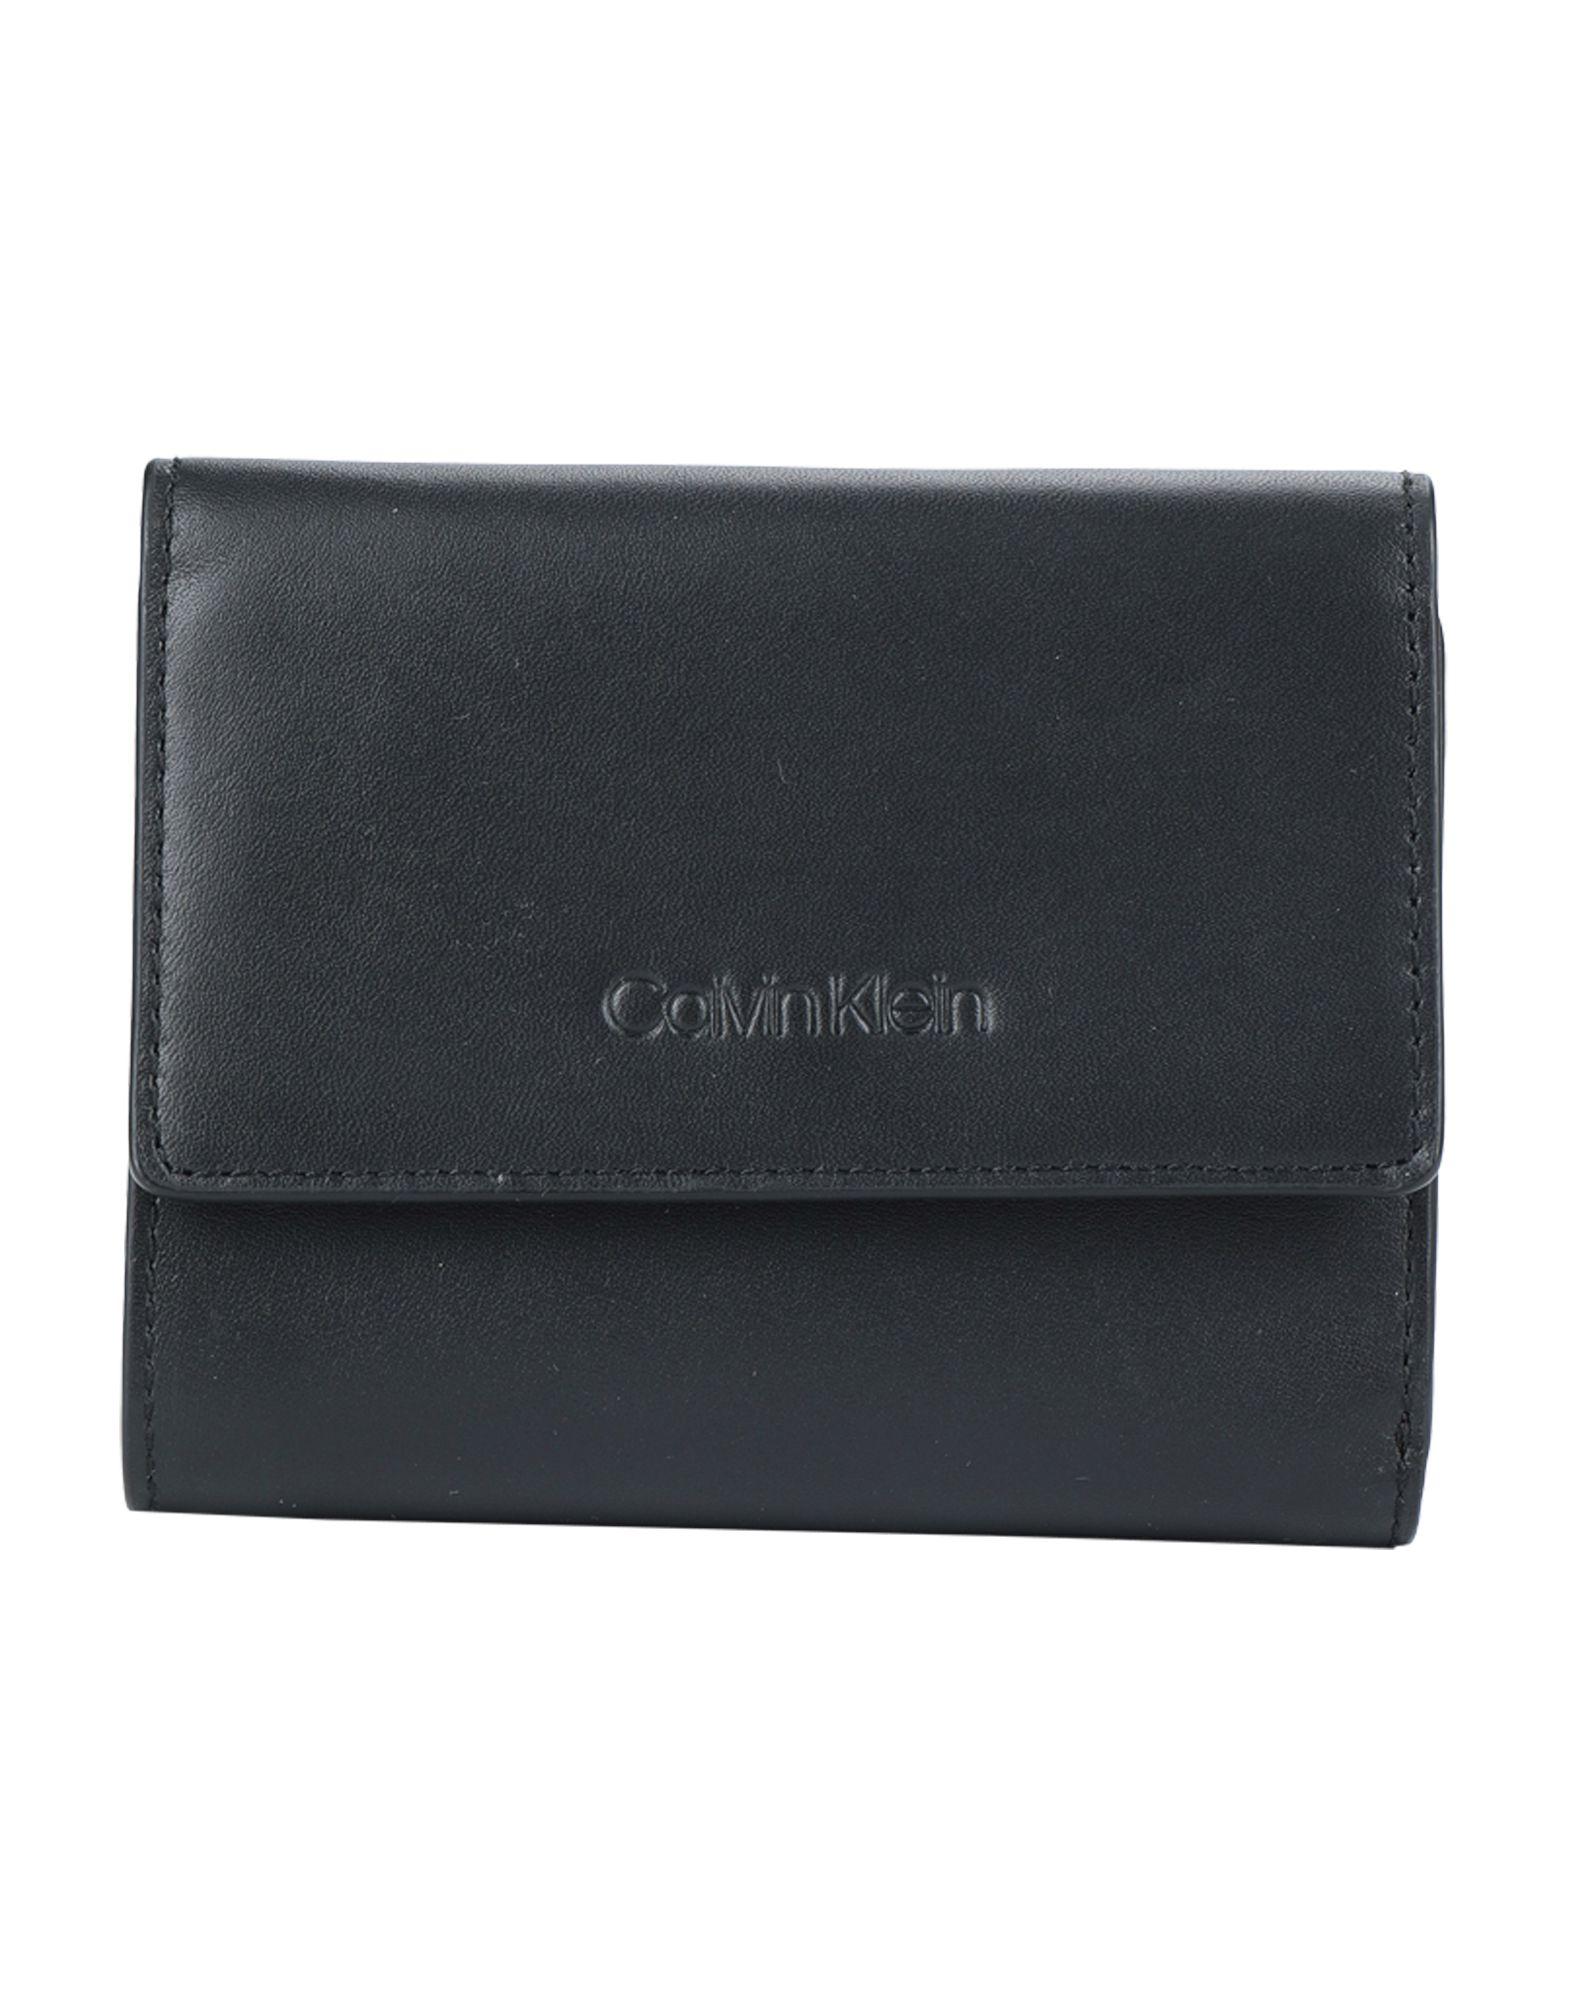 CALVIN KLEIN Бумажник calvin klein бумажник